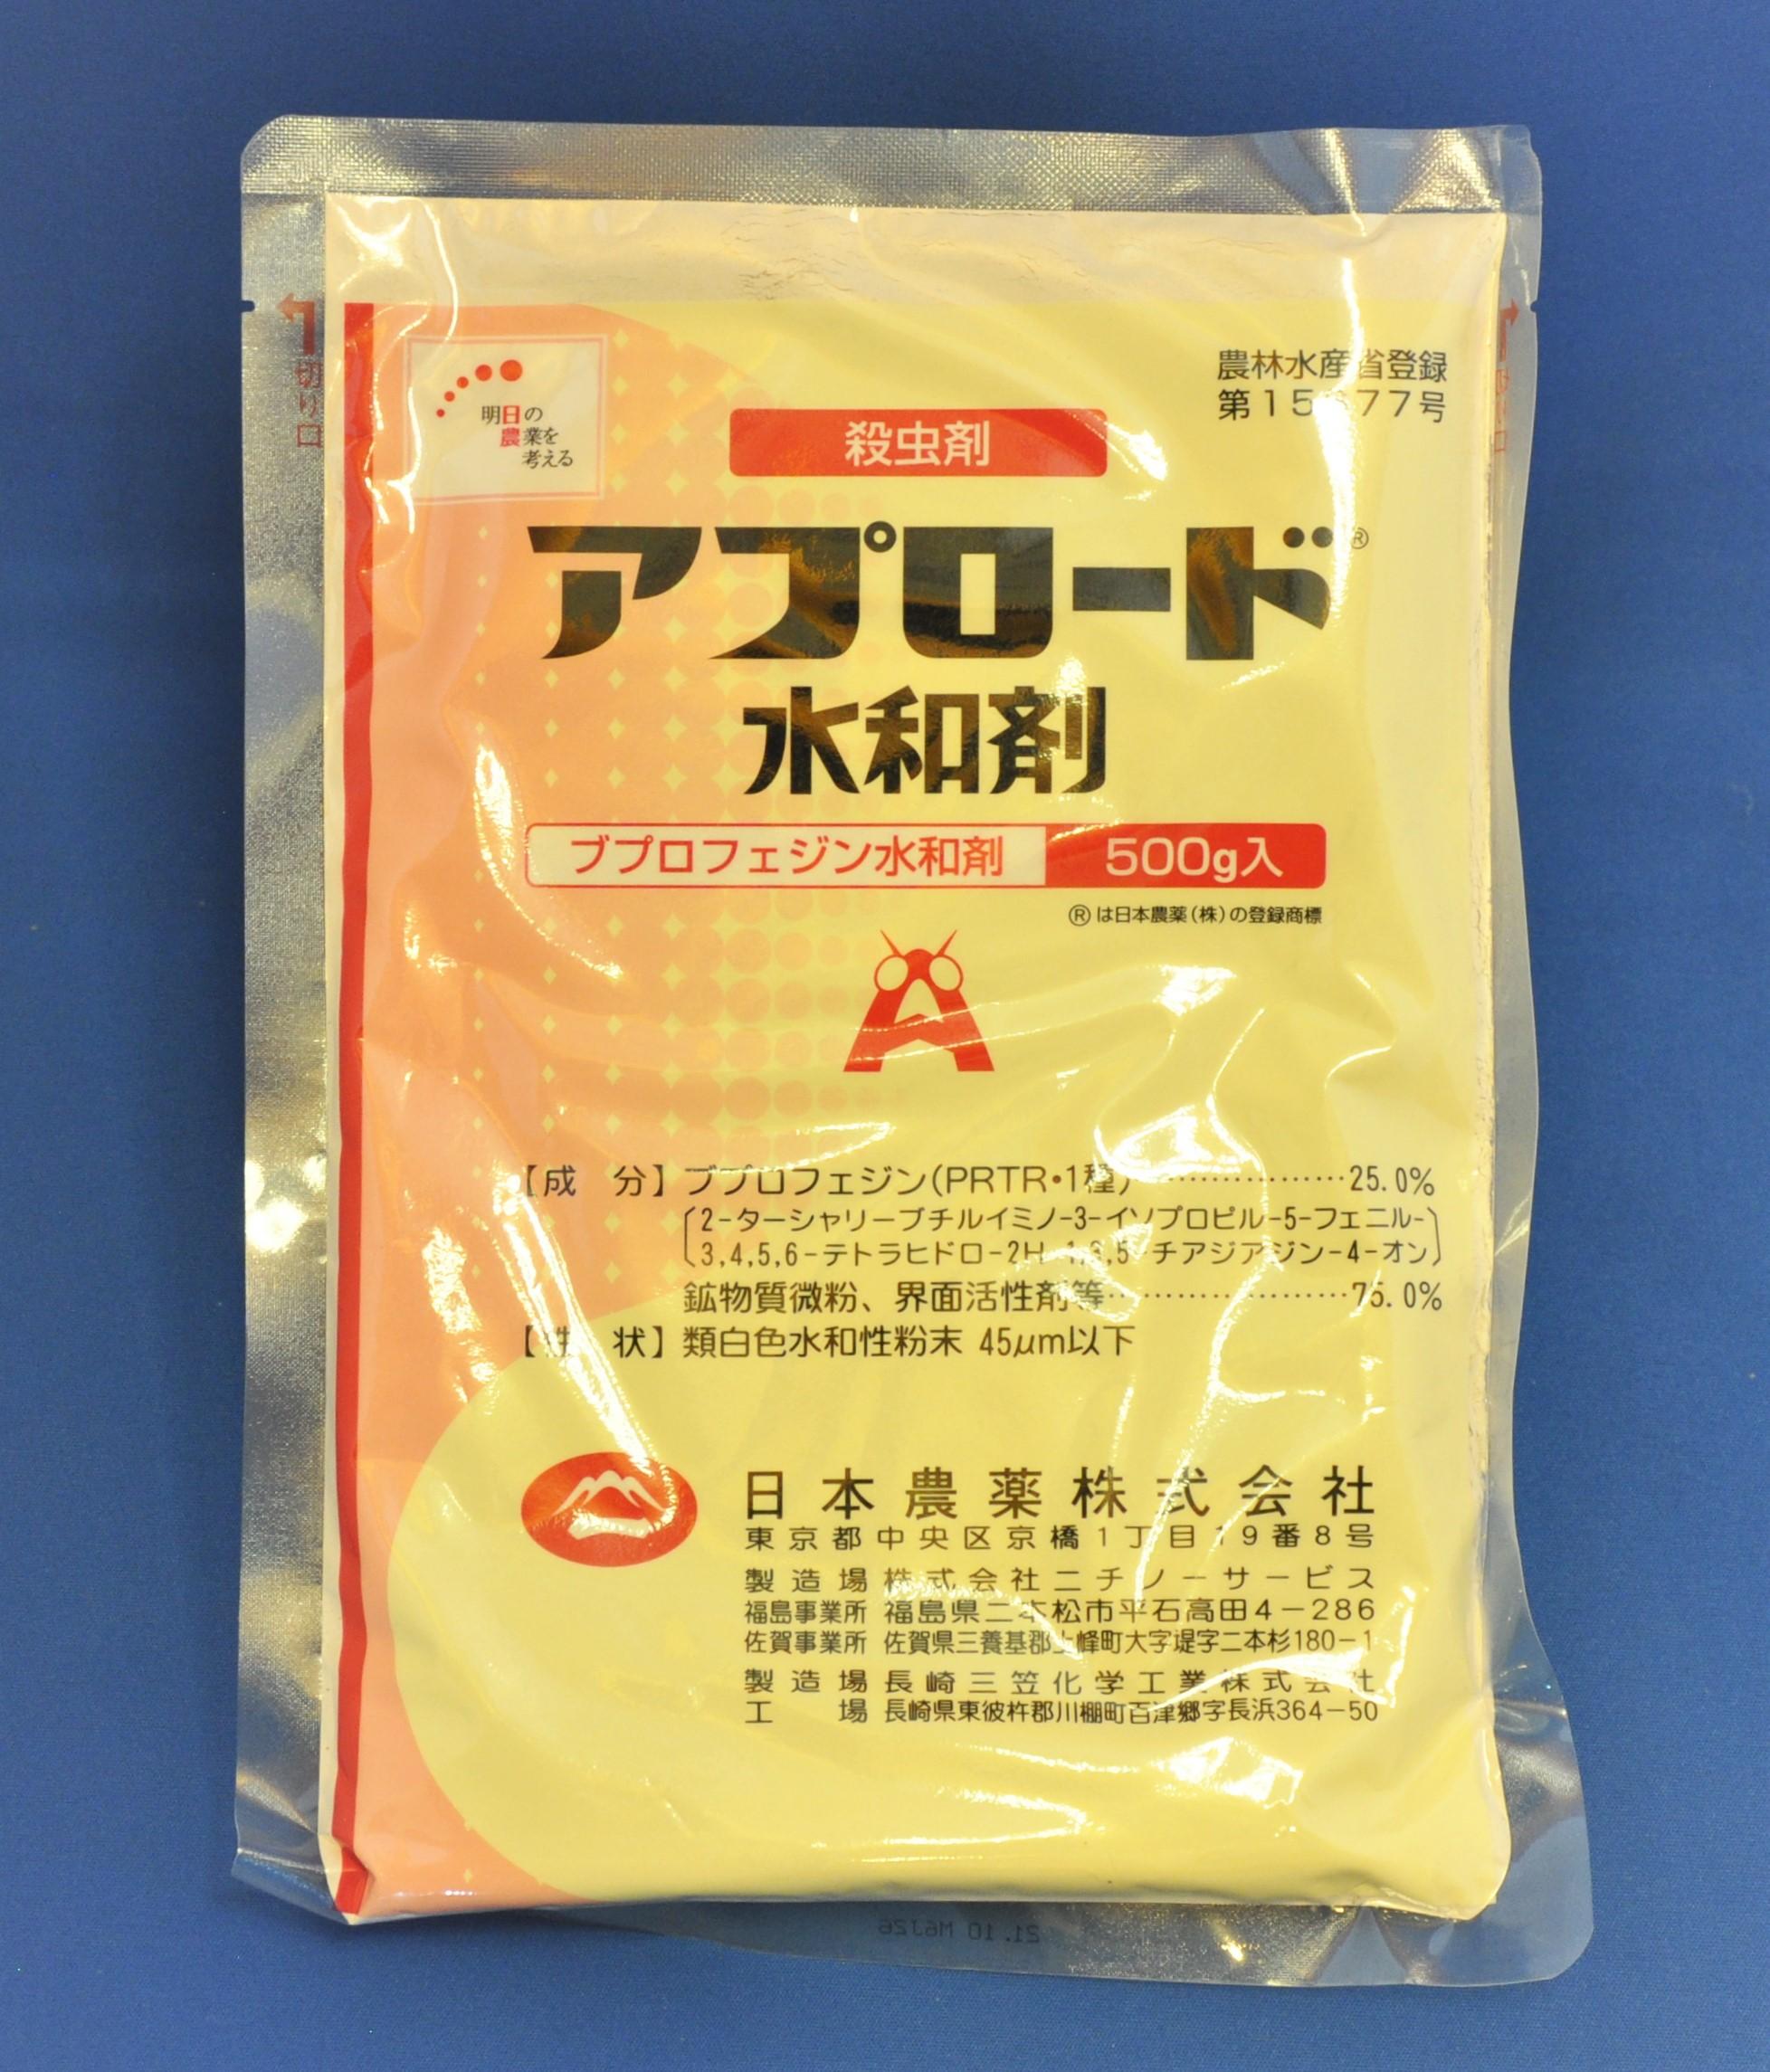 IPMに適した昆虫成長制御(IGR)剤「アプロード水和剤 500g」